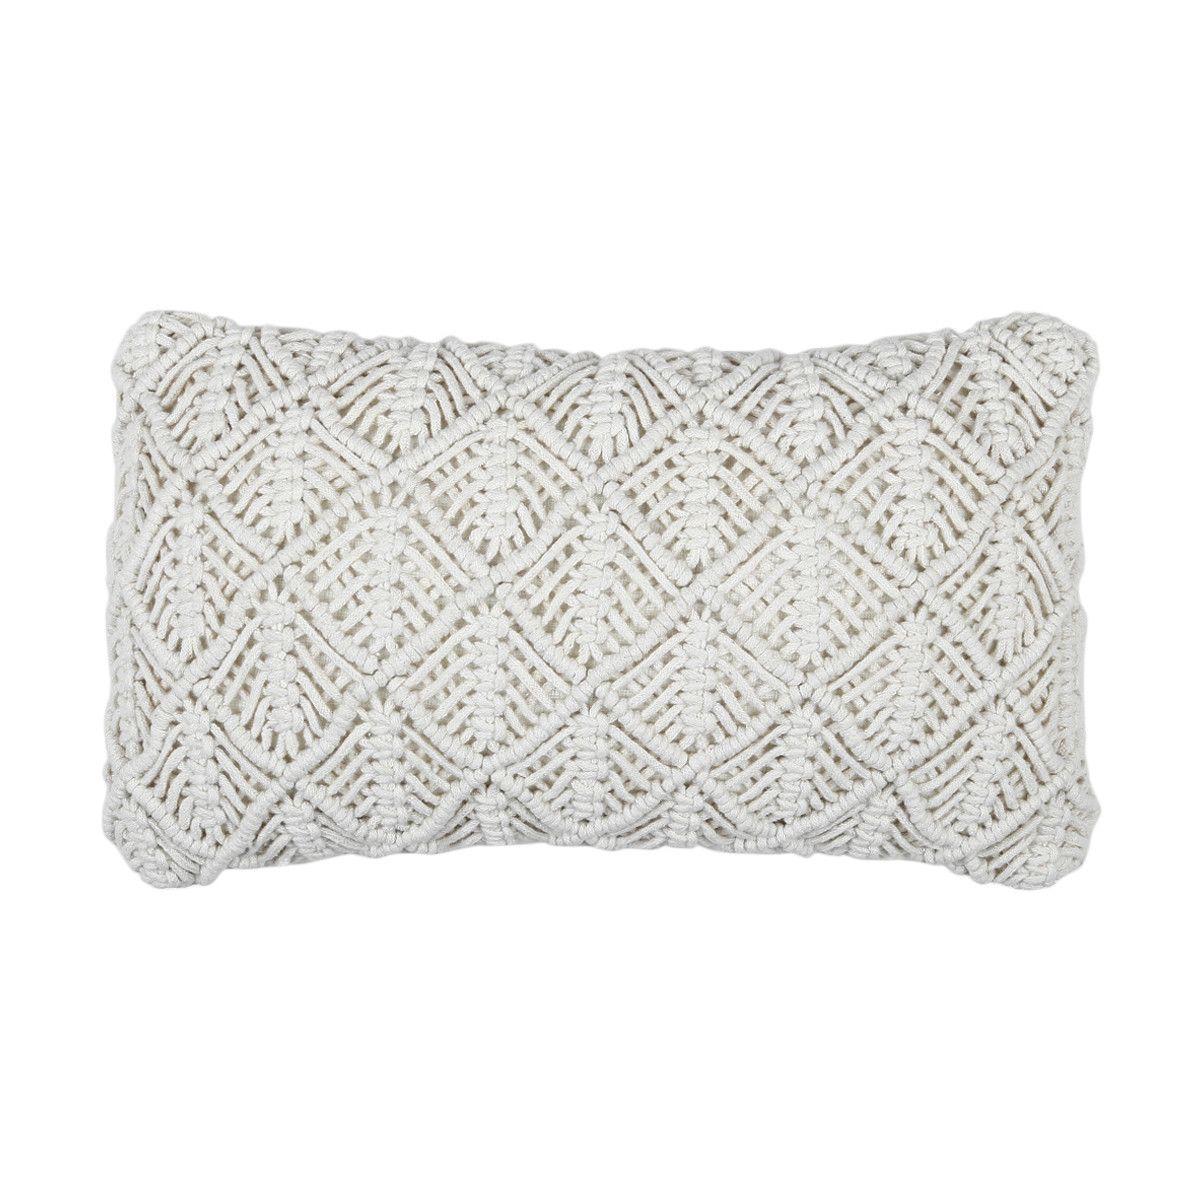 Willow Cushion Creme Kmart Boho Cushions Cushions Cushions